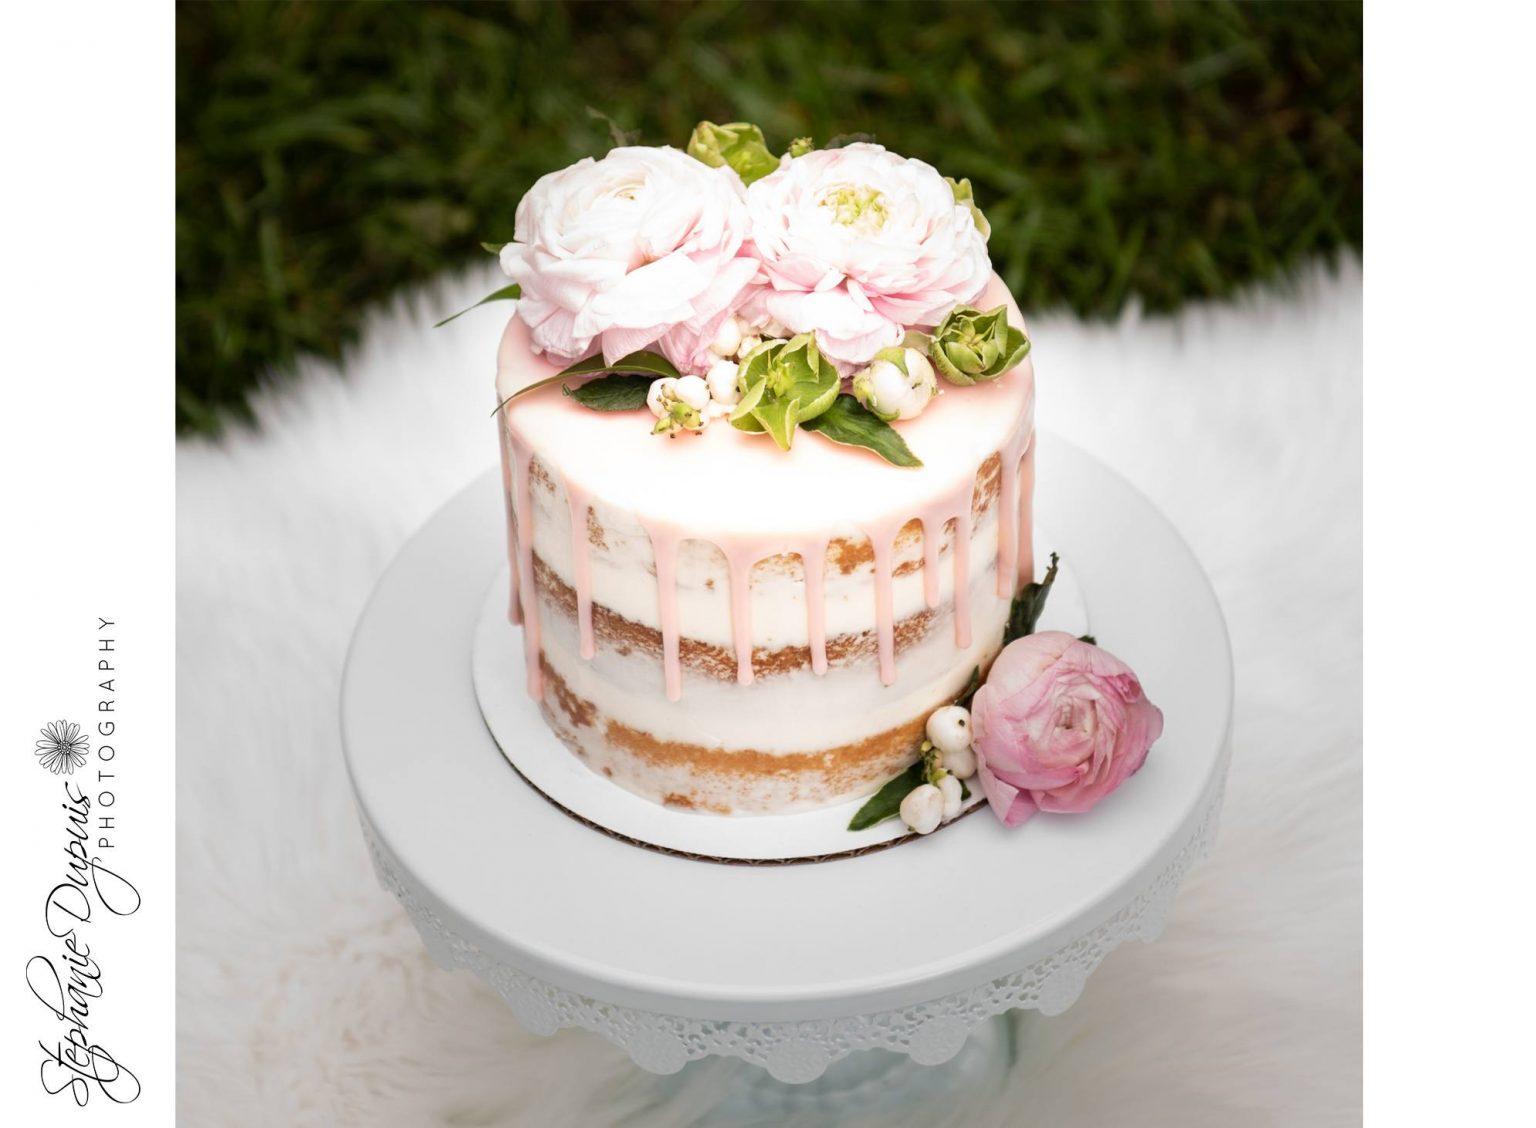 bromley cake smash 3 1536x1128 - Portfolio: Laura Mae Cake Smash